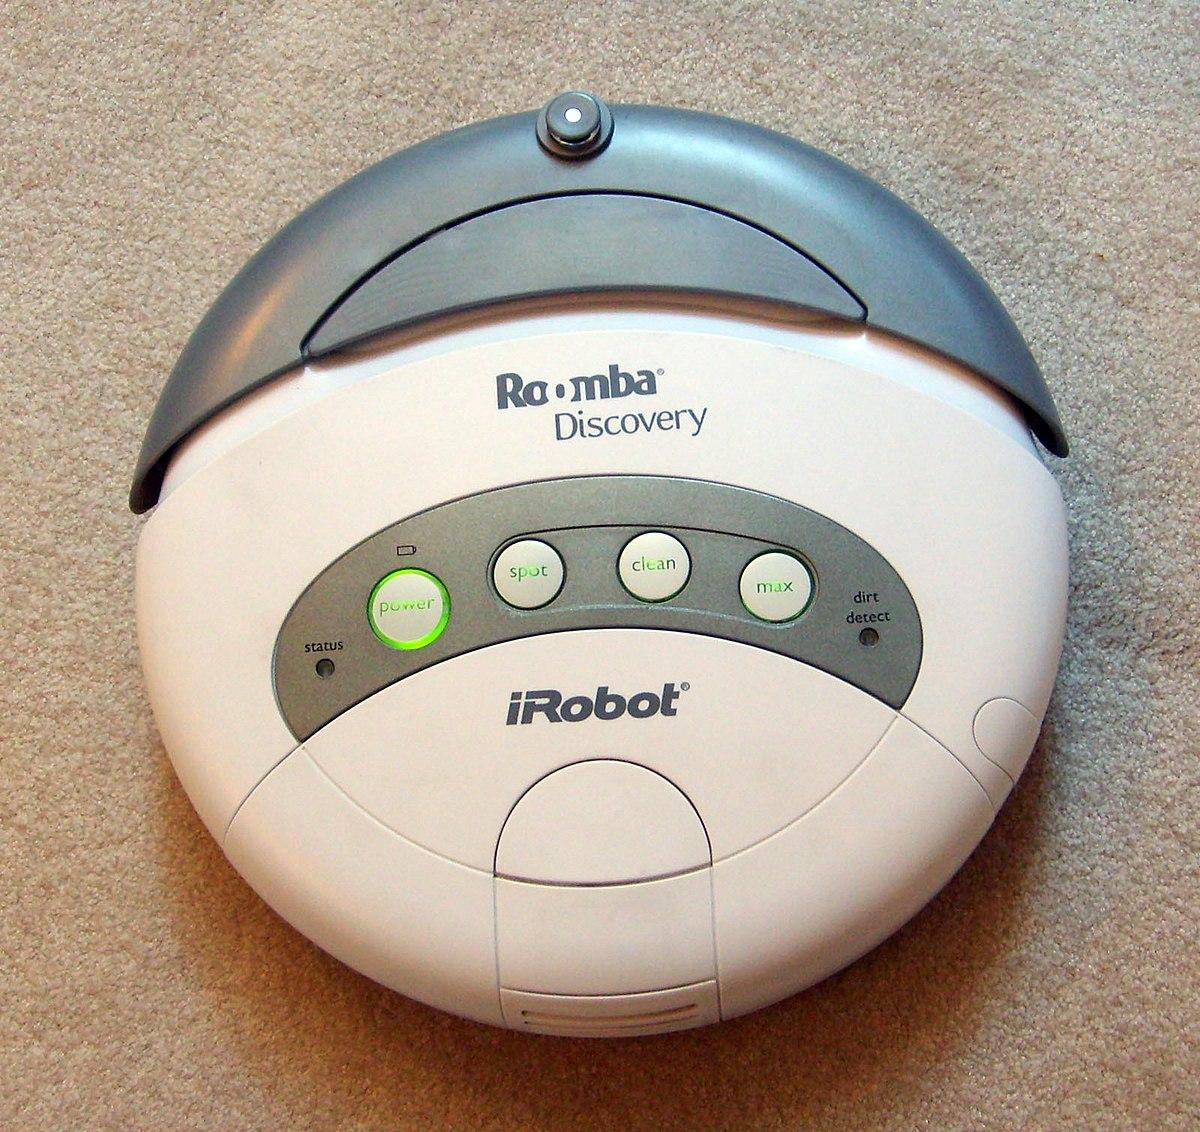 Roomba Wikipedia